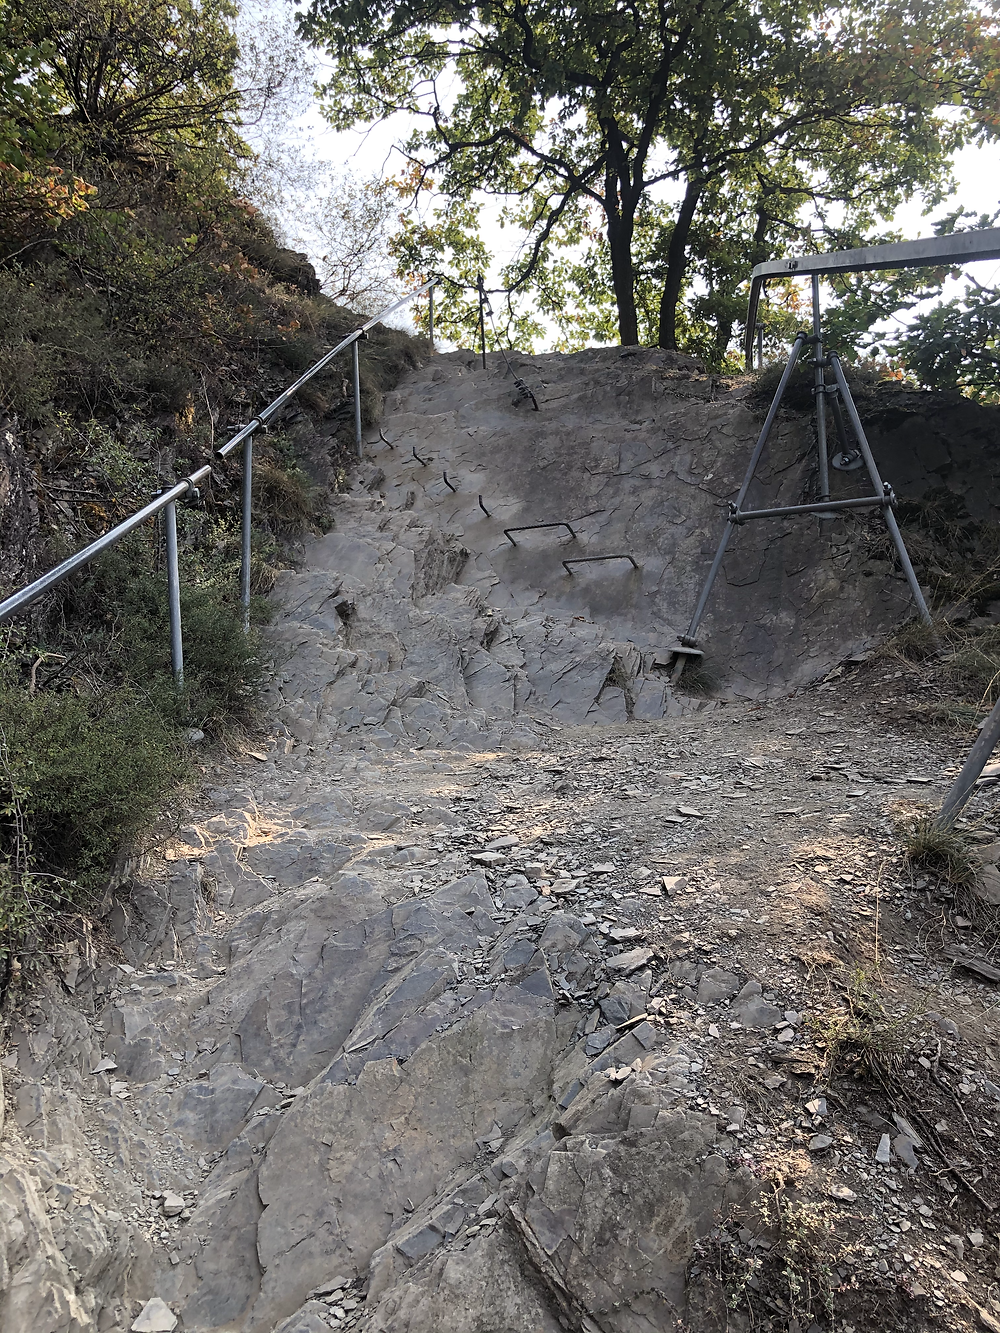 Calmont-Klettersteig-Mosel-wanderweg-Moselschleife